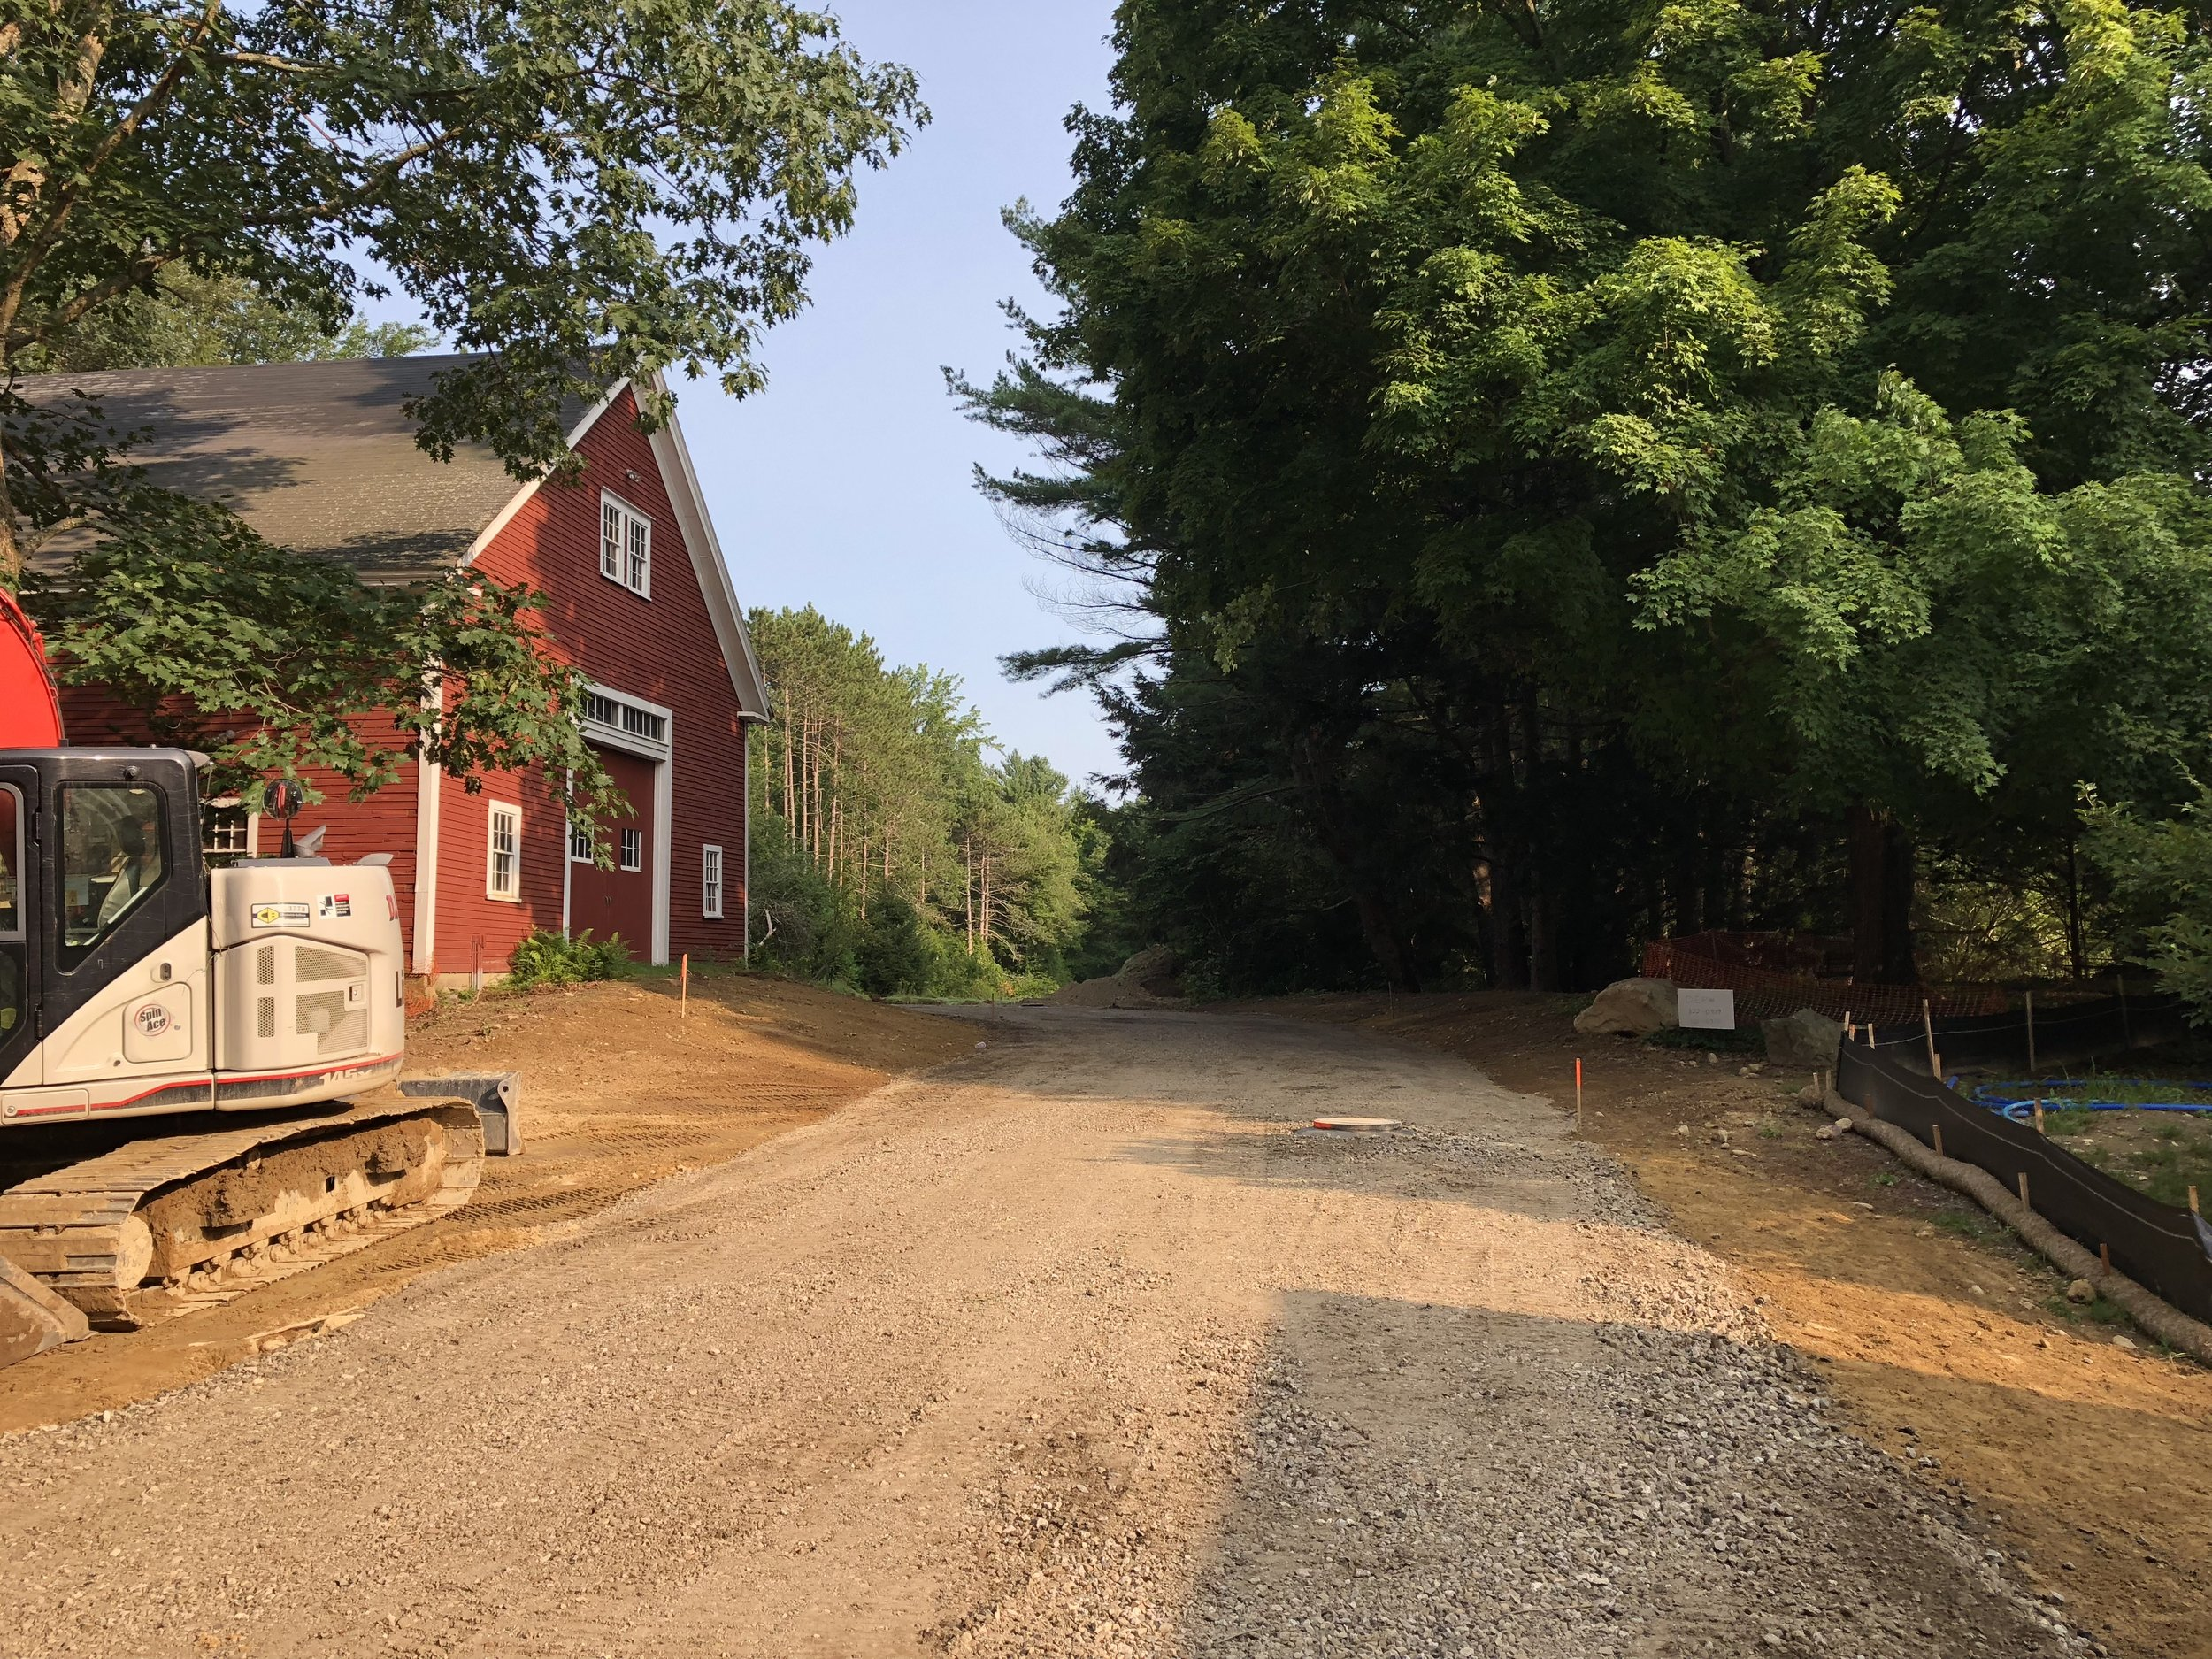 moore rd driveway barn.jpg